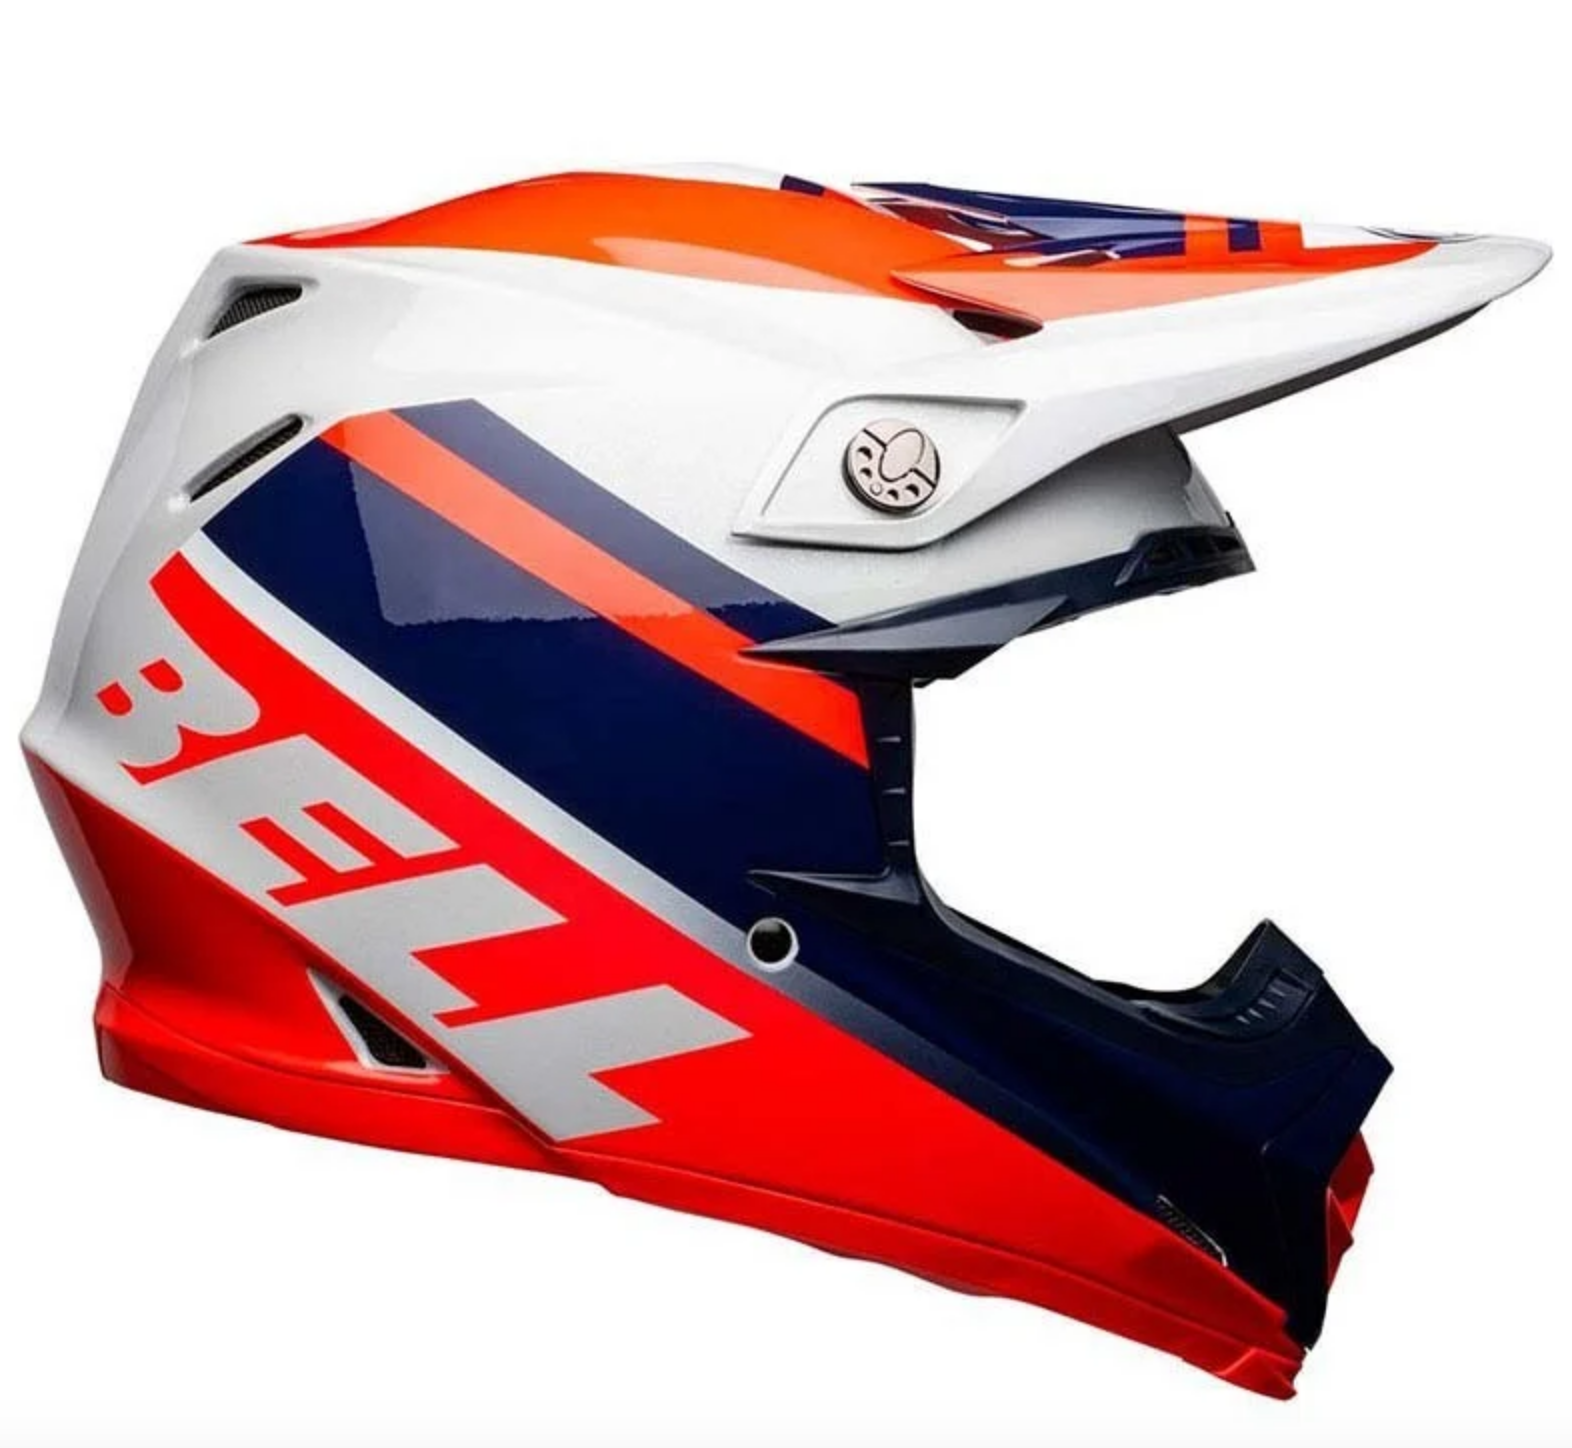 Casco Cross Bell Moto 9 Mips Prophecy Gloss Infrared Navy Gray 1